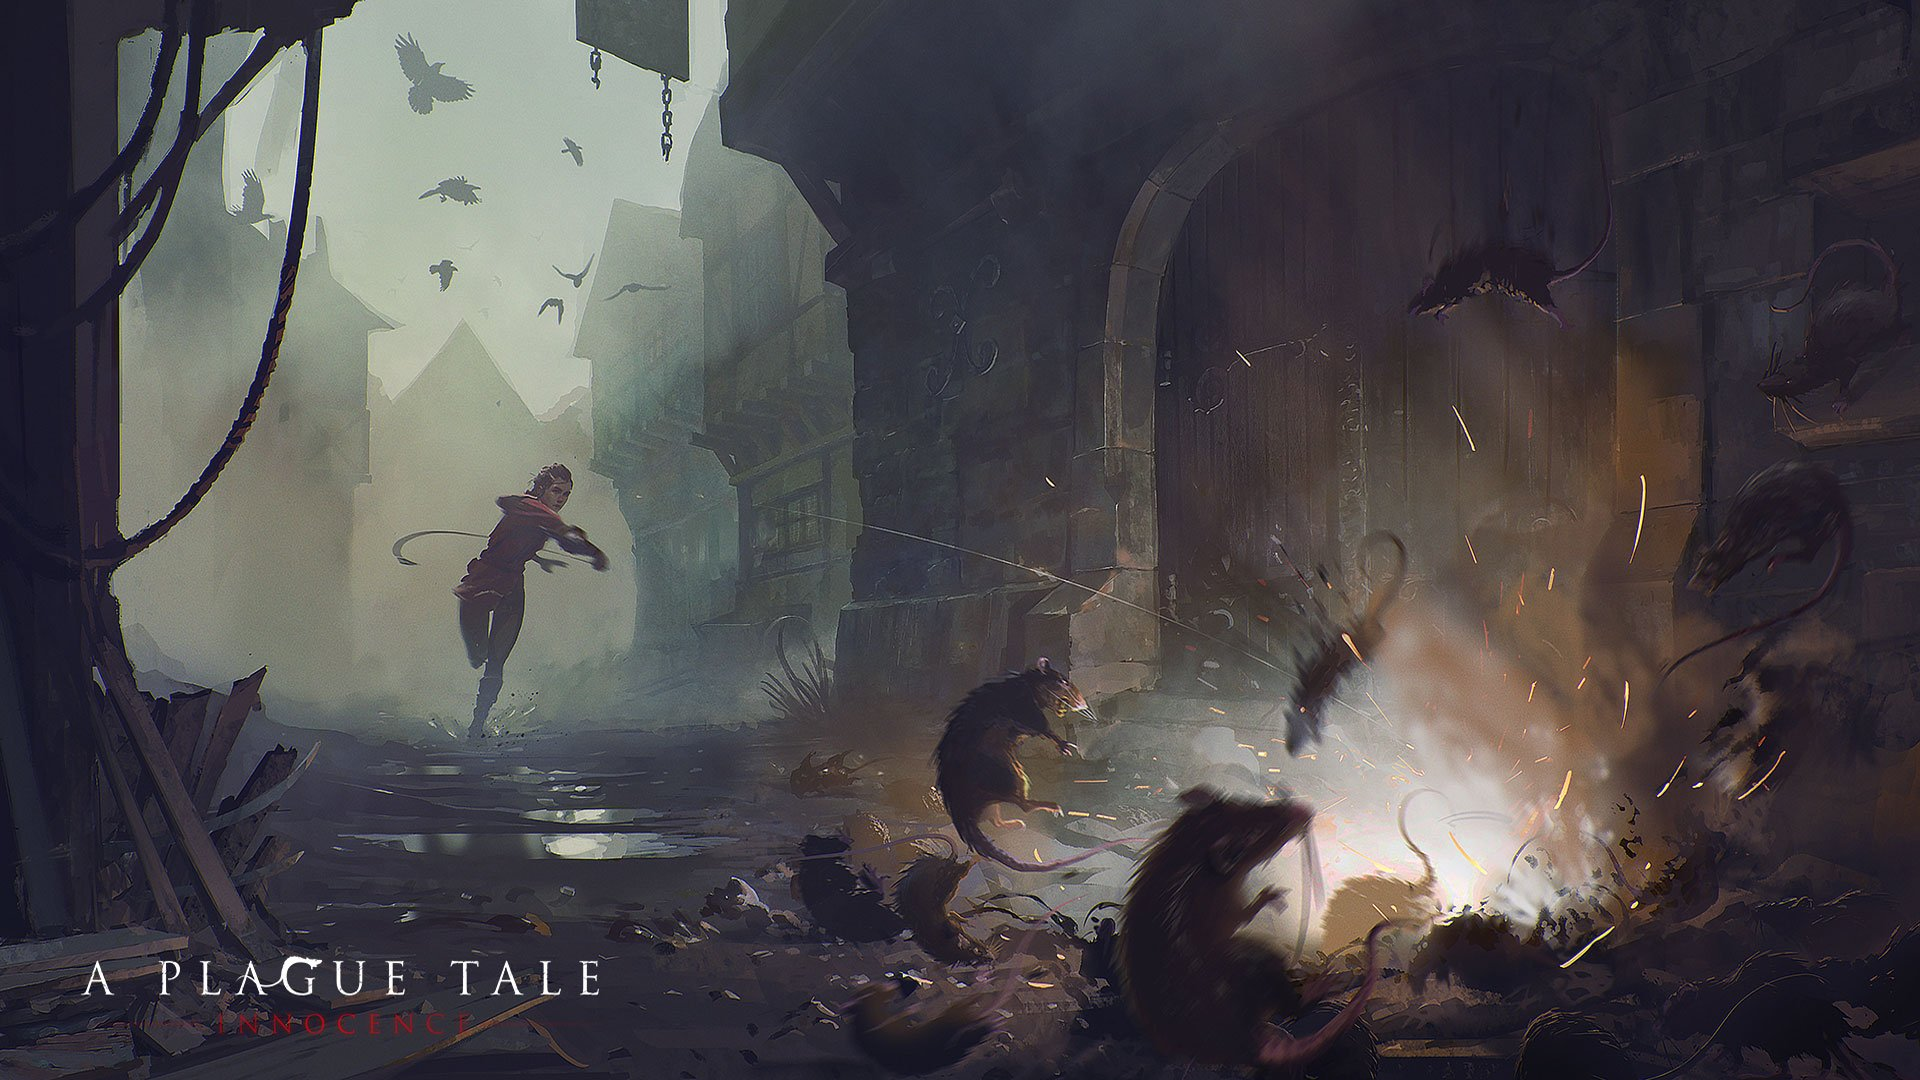 A Plague Tale Innocence Concept Art 3